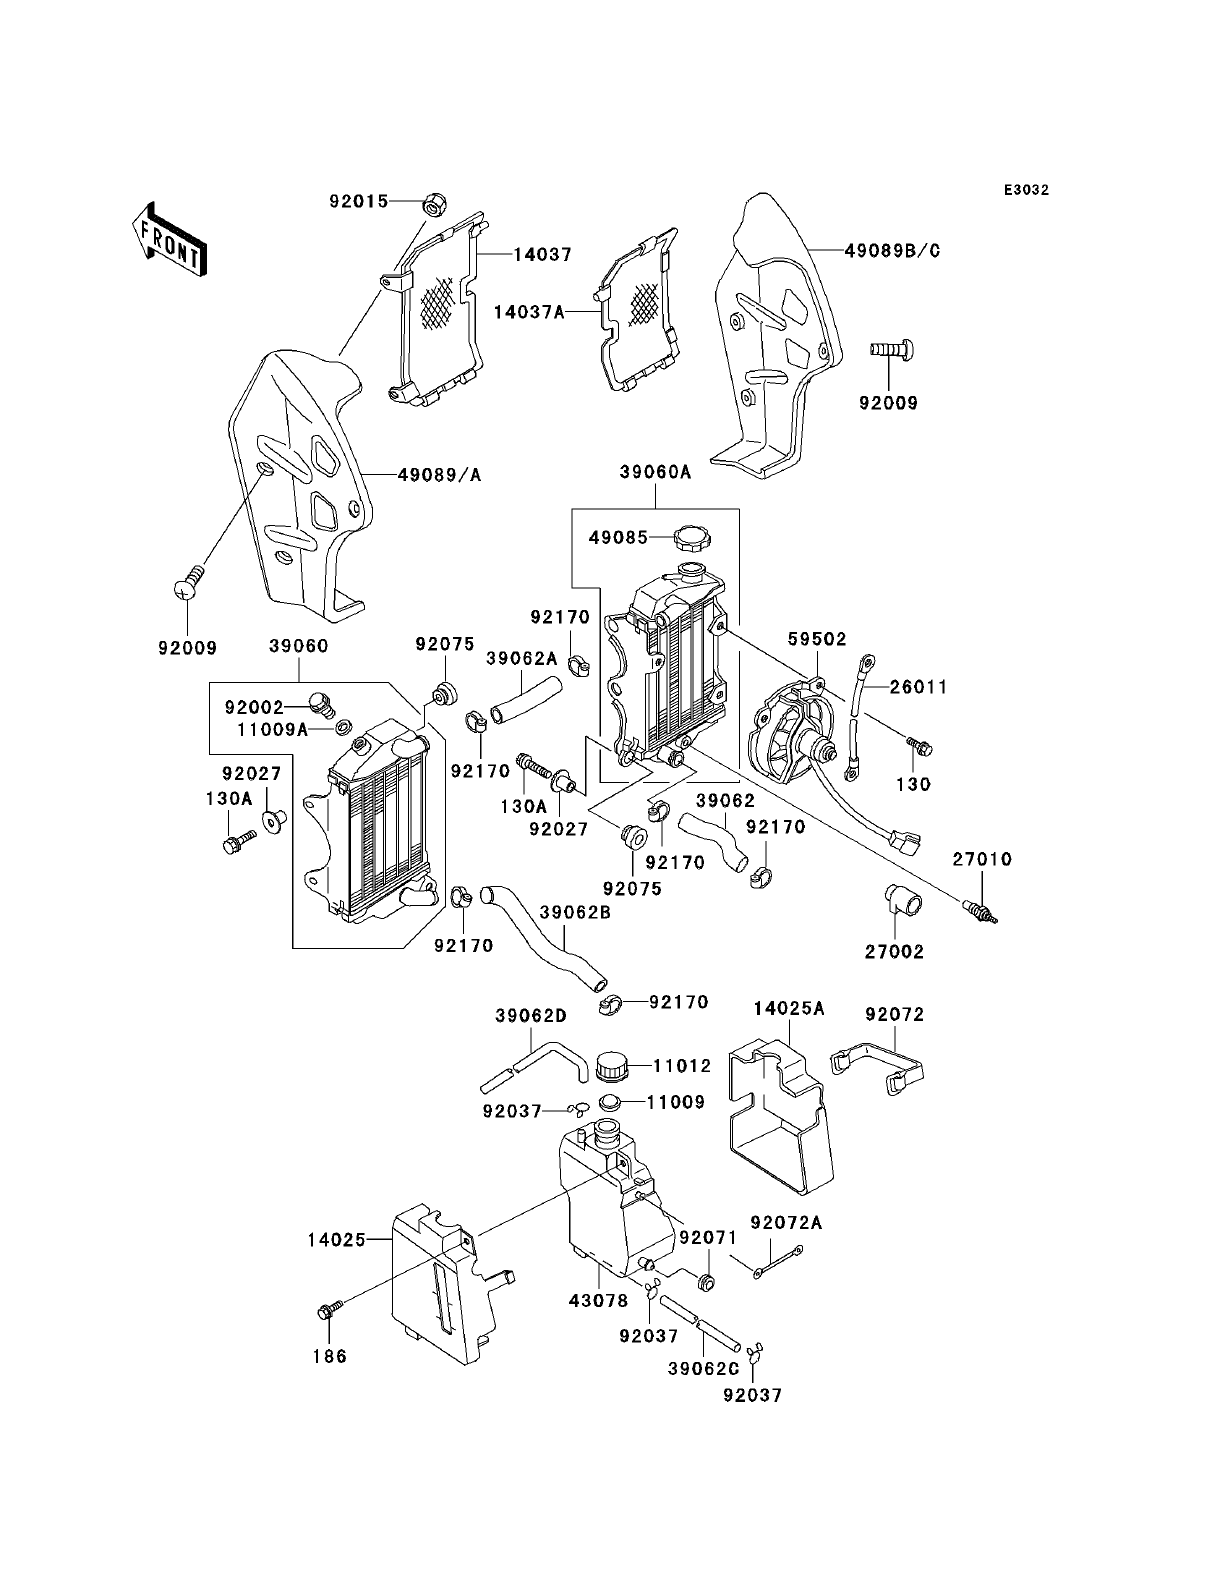 klr250 wiring diagram auto electrical wiring diagram kawasaki klr250 klr 250 wiring diagram